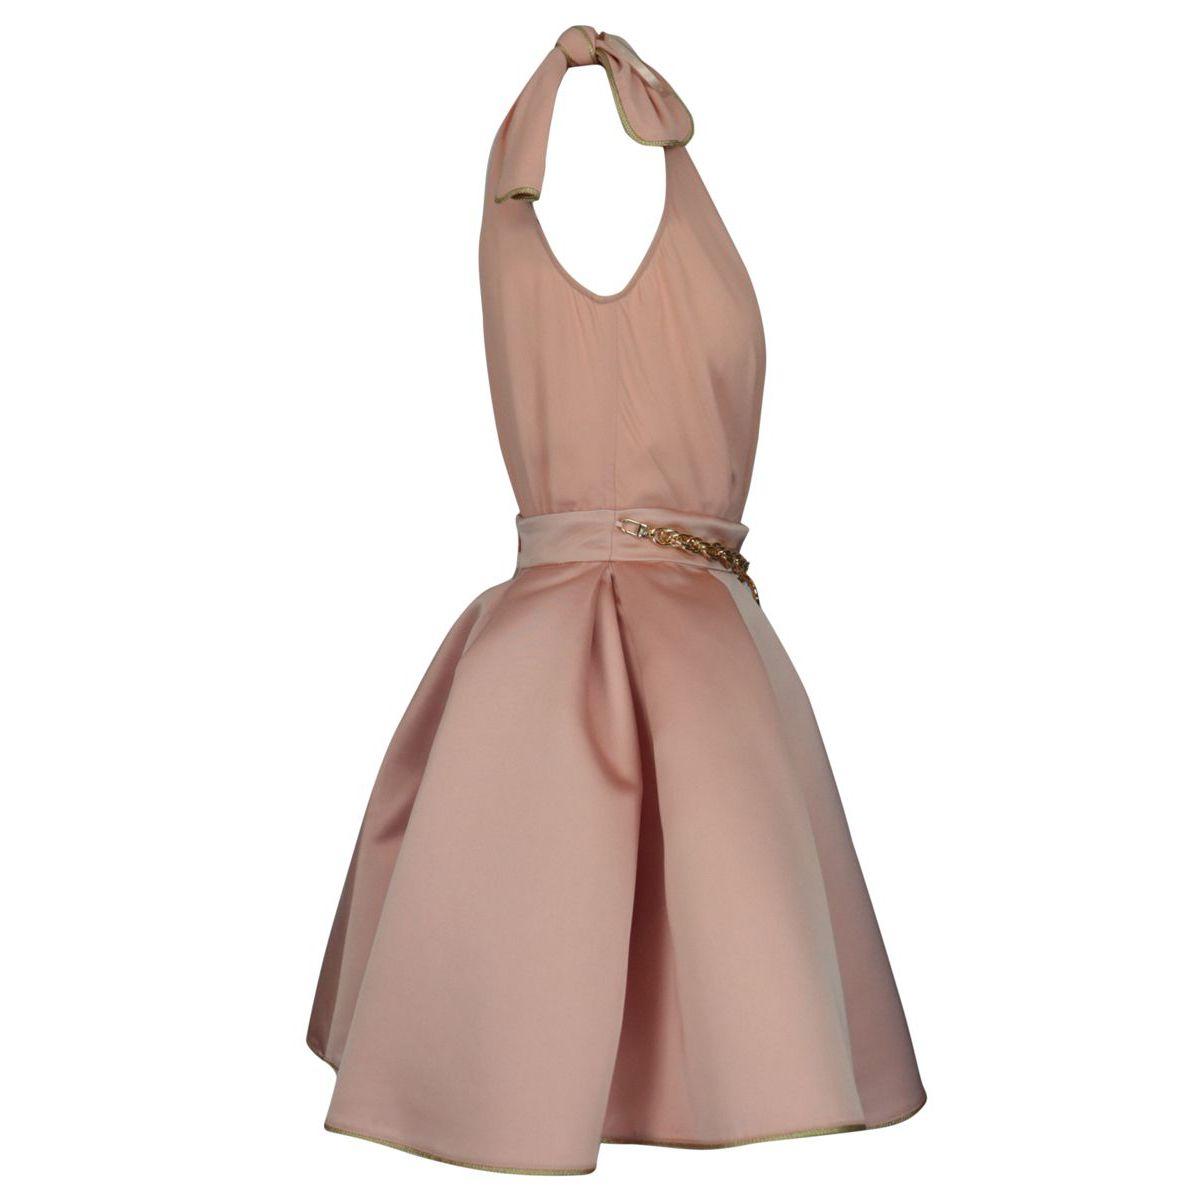 Sleeveless georgette and duchess dress Antique pink Elisabetta Franchi